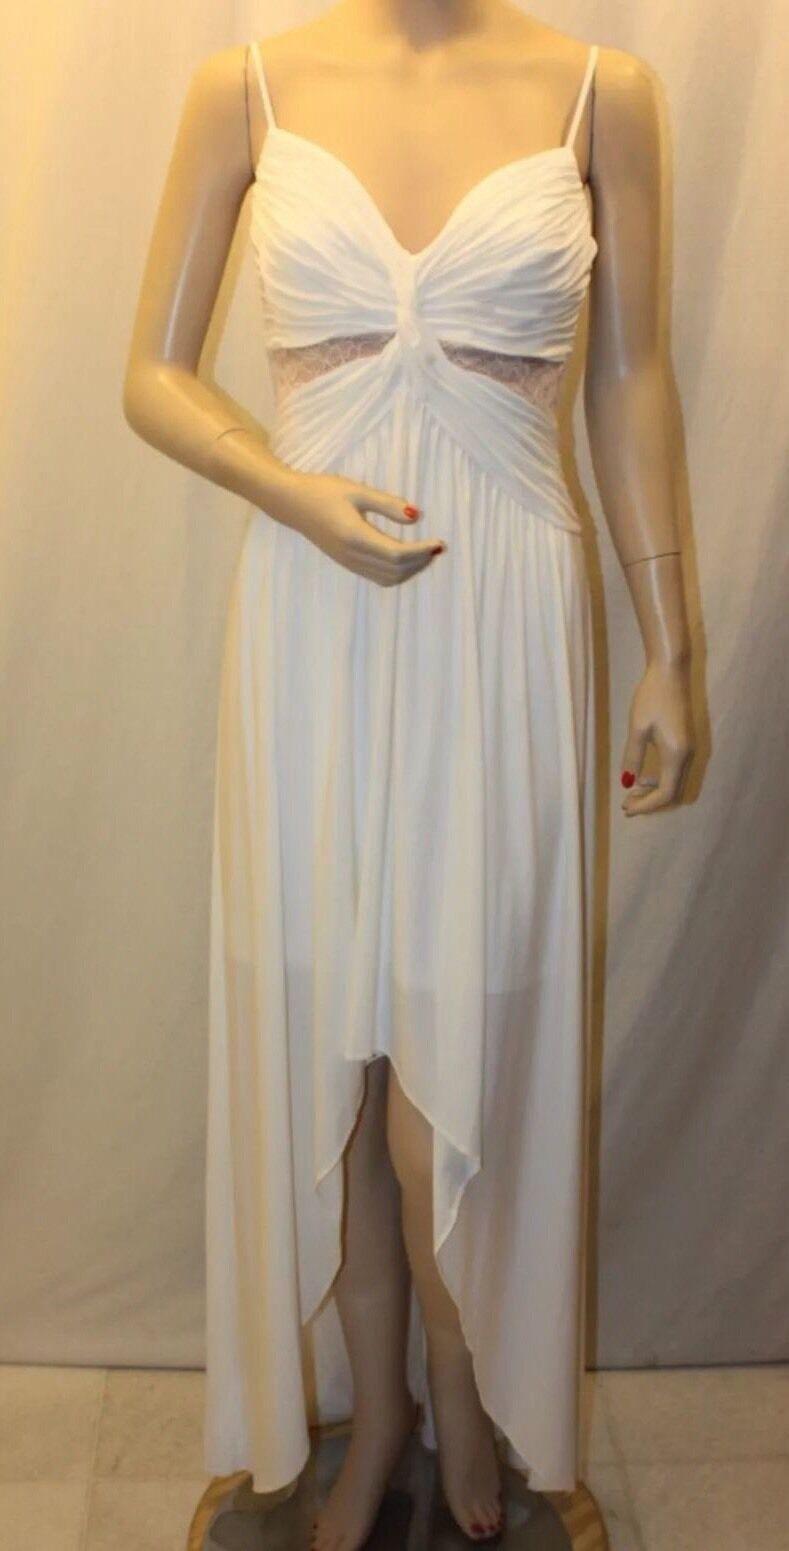 New New New with tag  198 BCBG MAX AZRIA WHITE SOPHIA B607 Dress Sz 6 2adf27